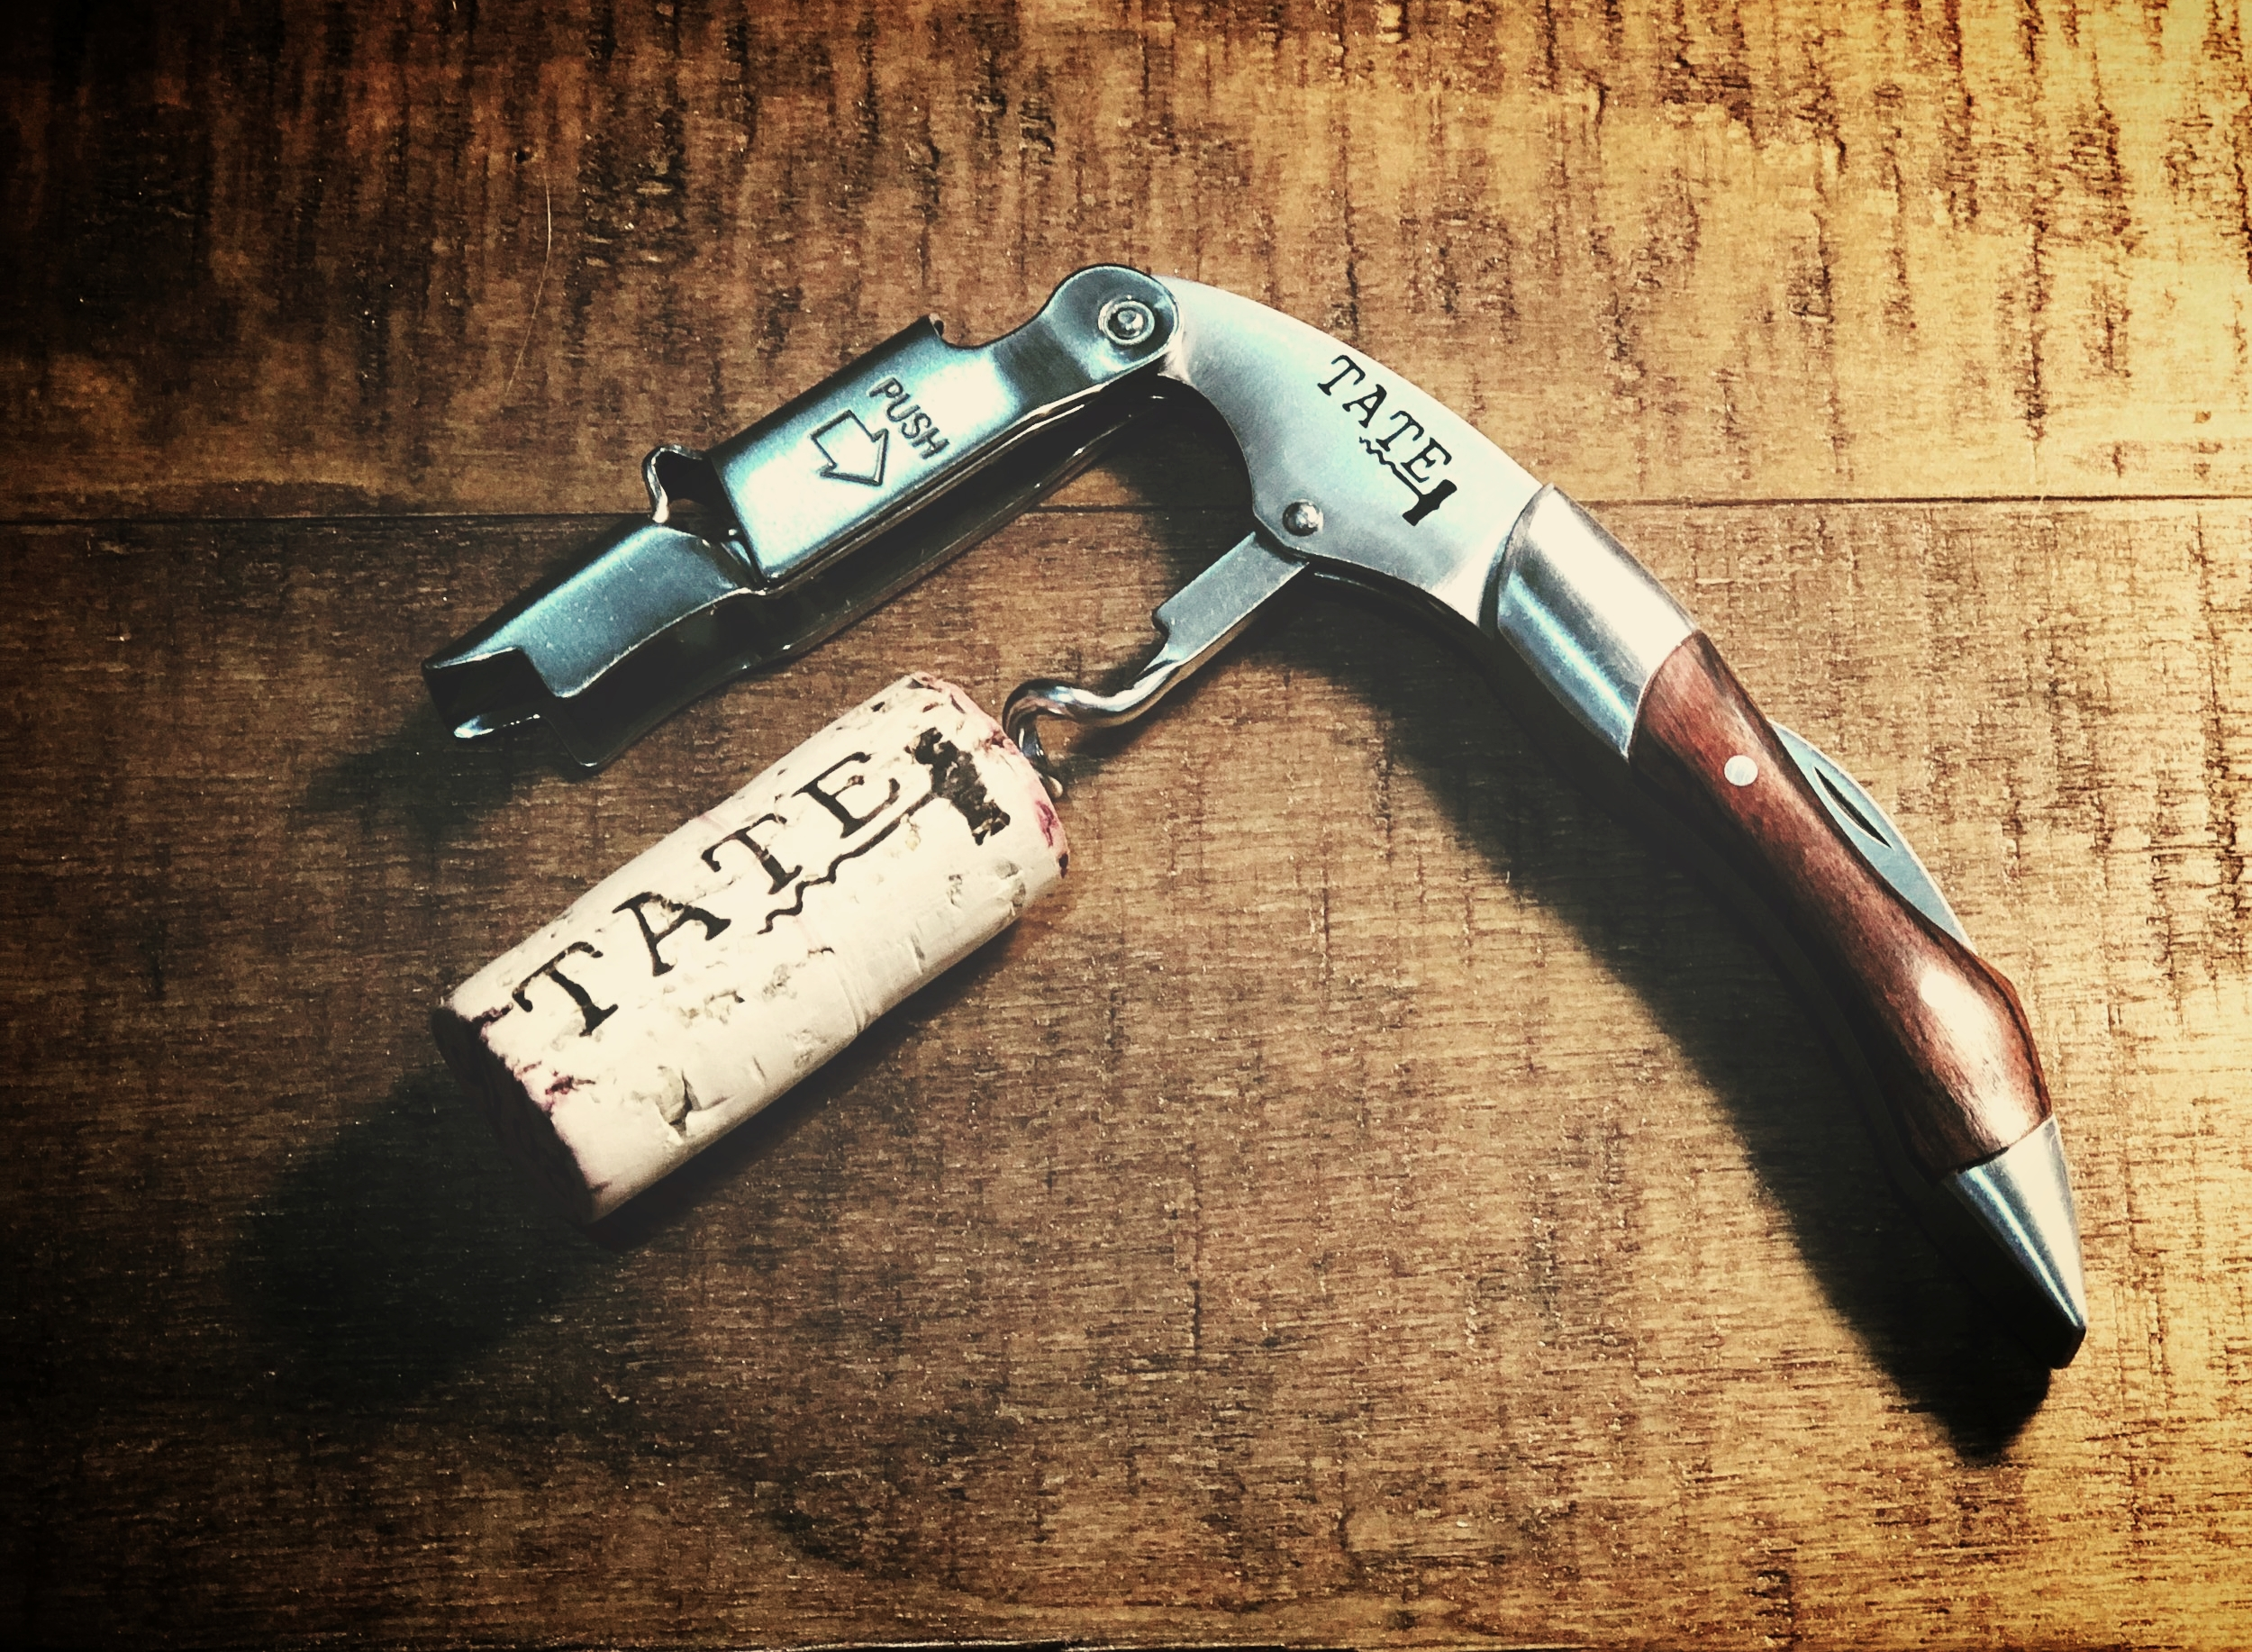 corkscrew image.JPG